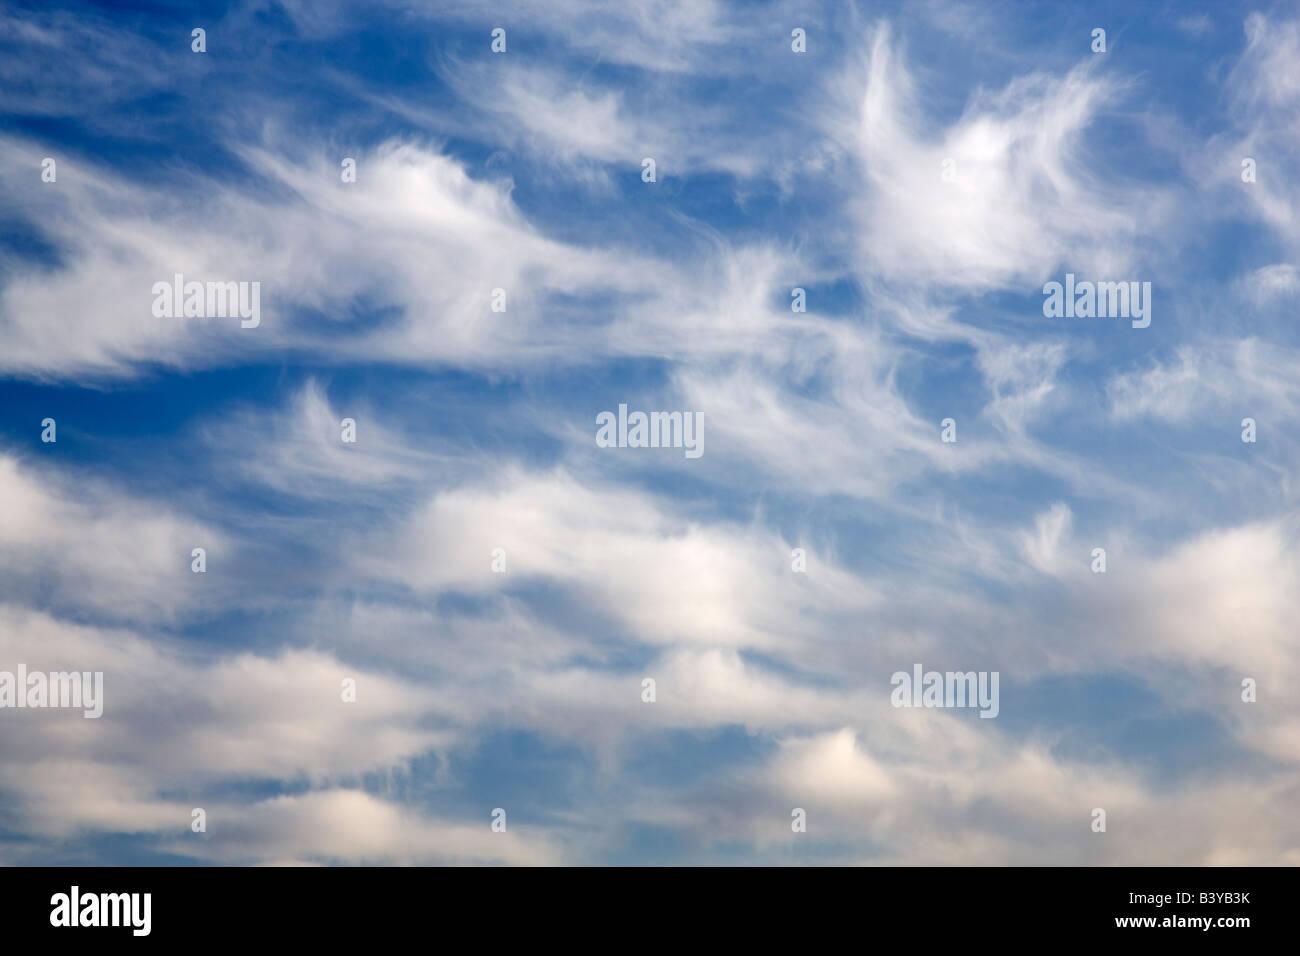 Cloud patterns. Stock Photo